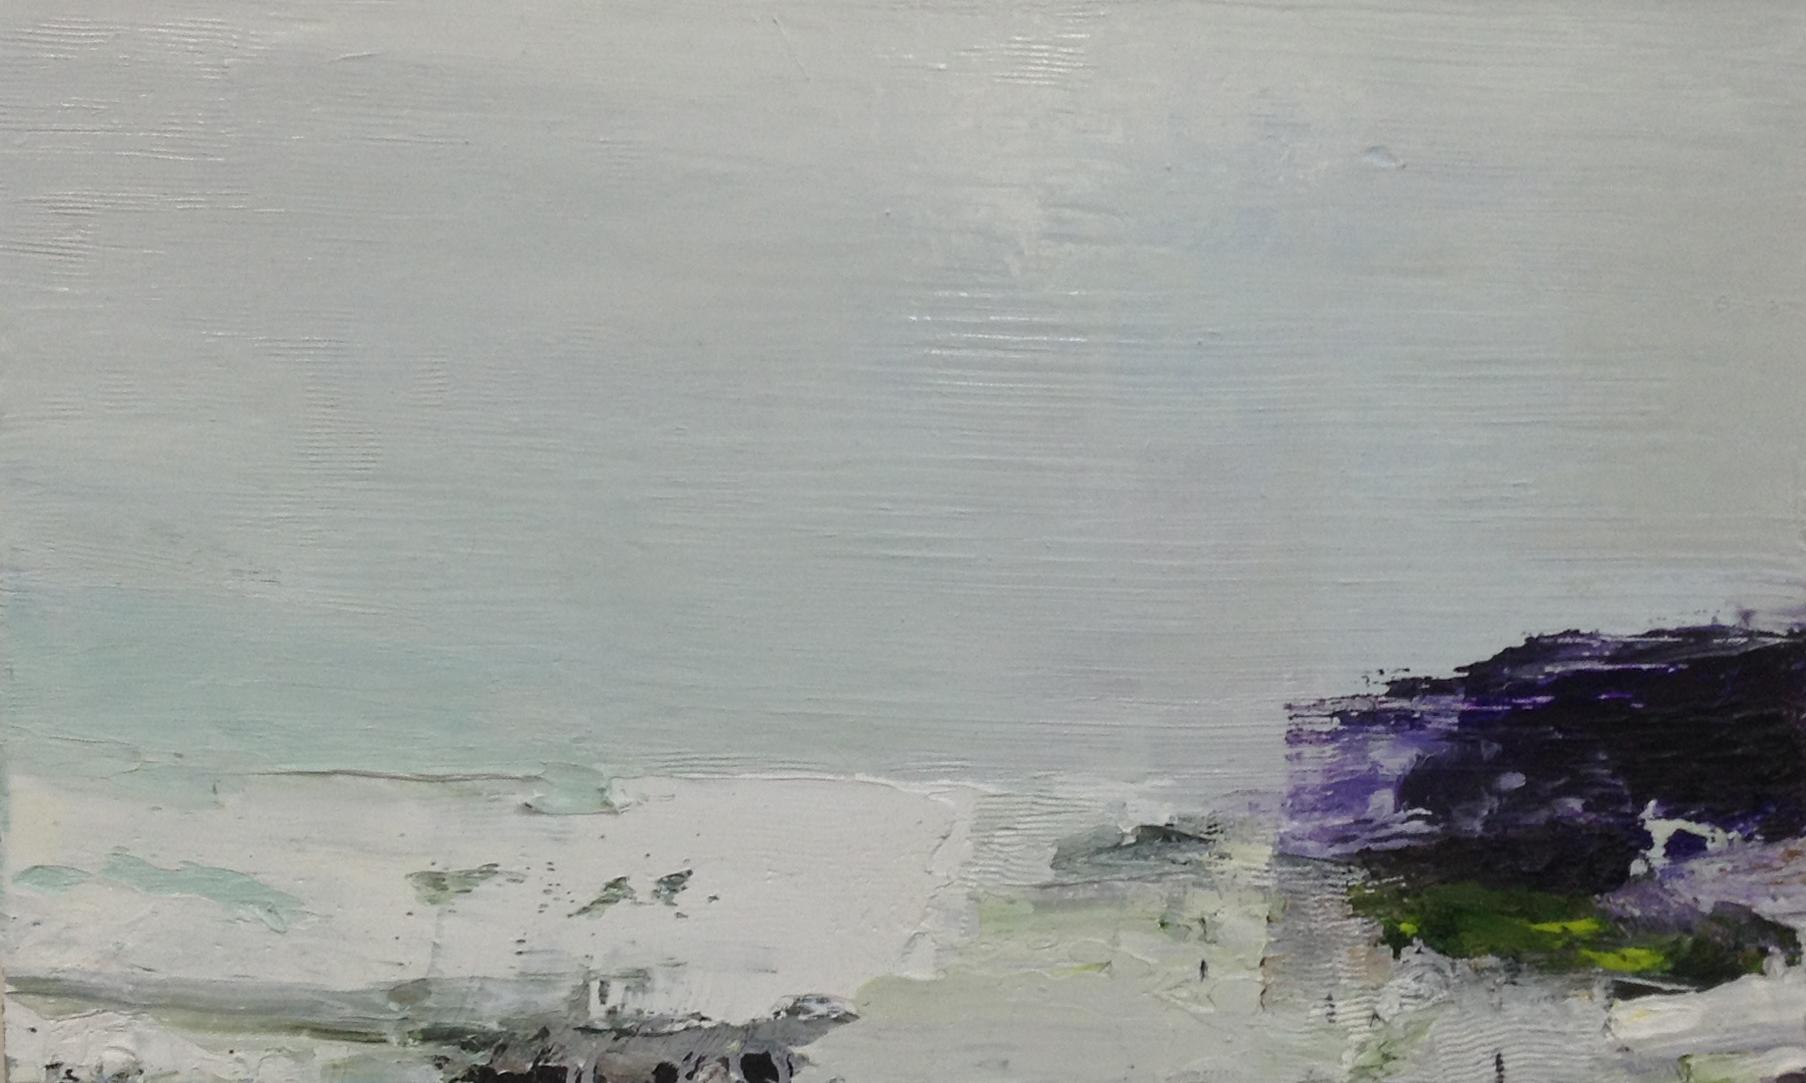 Gareth Edwards RWA Porthmeor Beach, January 50 x 30 cm oil on canvas £ 1450